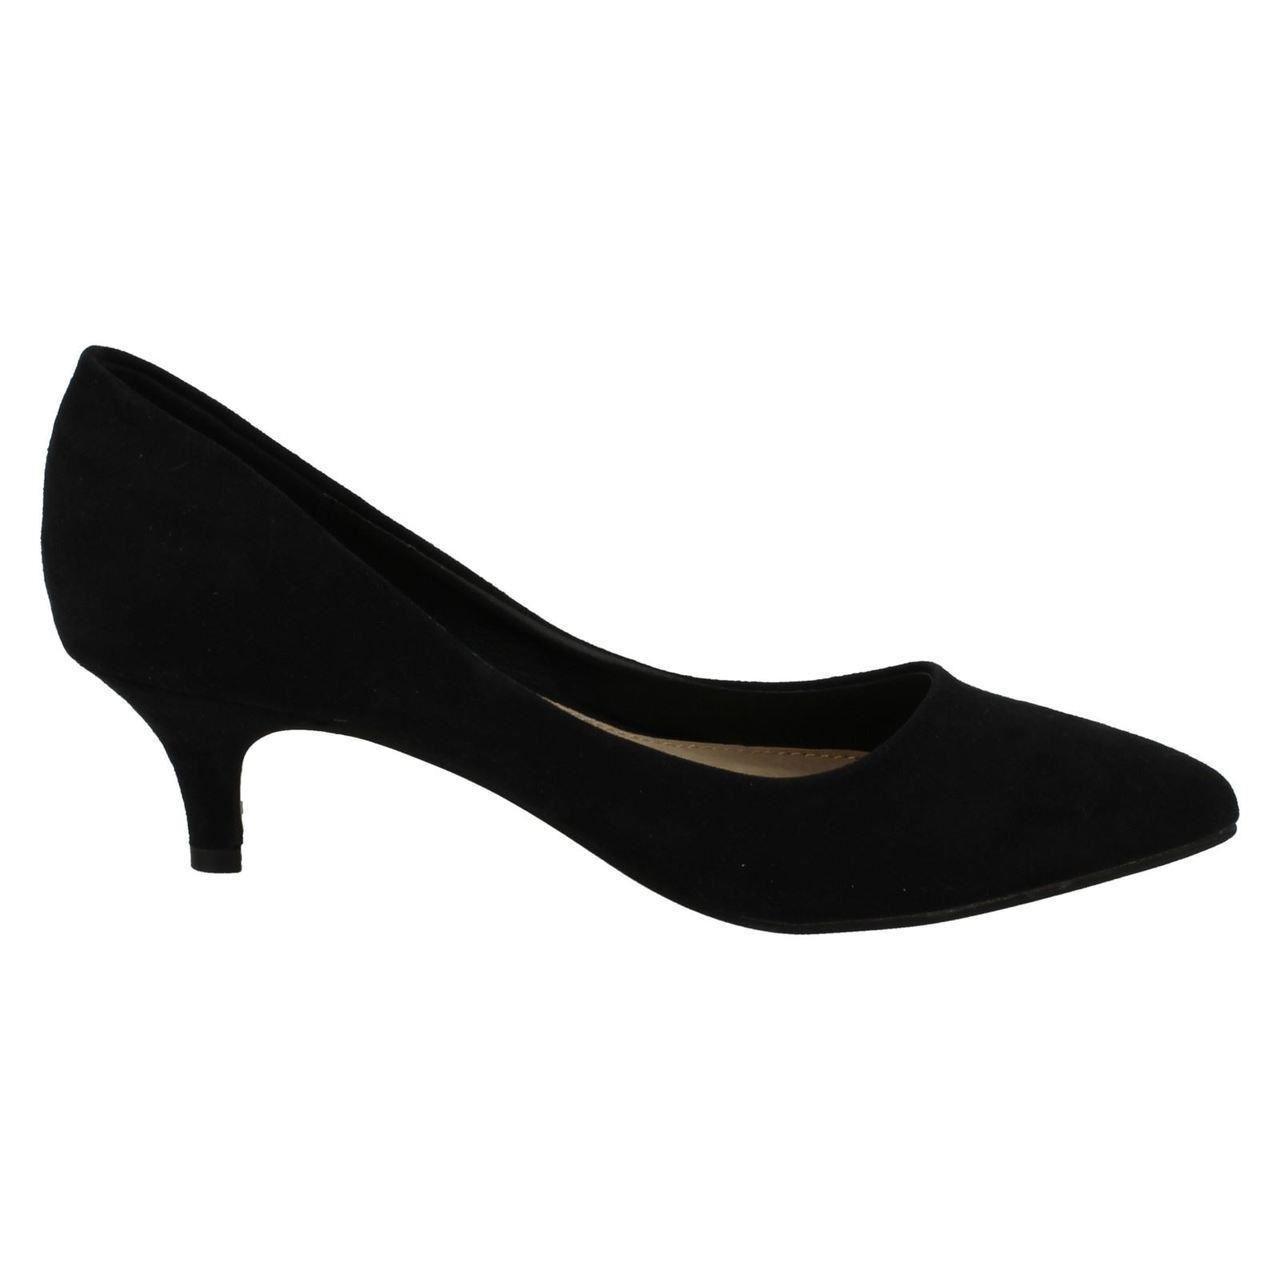 Damas Spot on F9658 Tribunal Zapatos Imitación Gamuza cotidianos ~ K